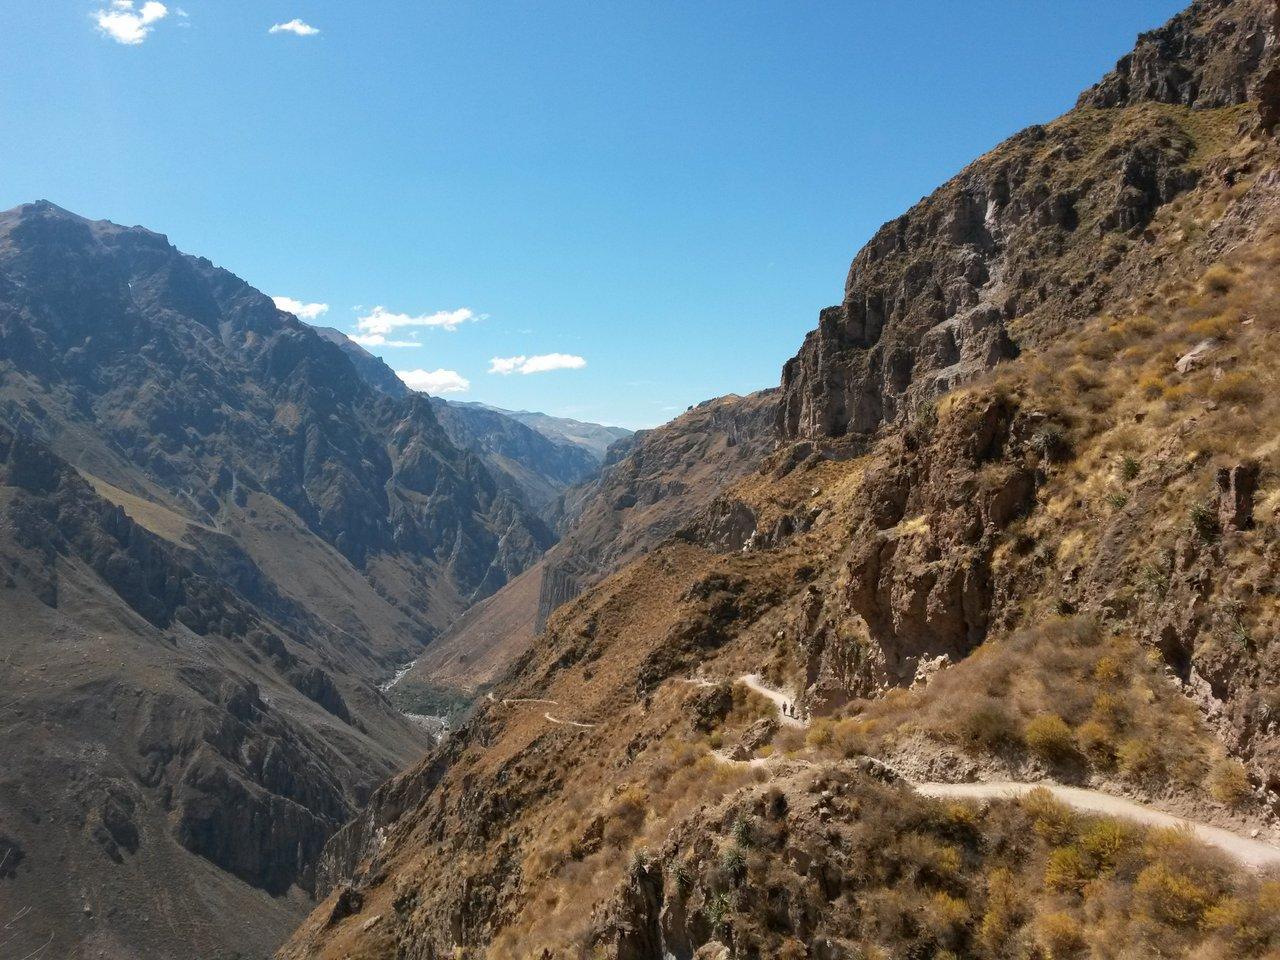 canyon del colca trekking: la partenza